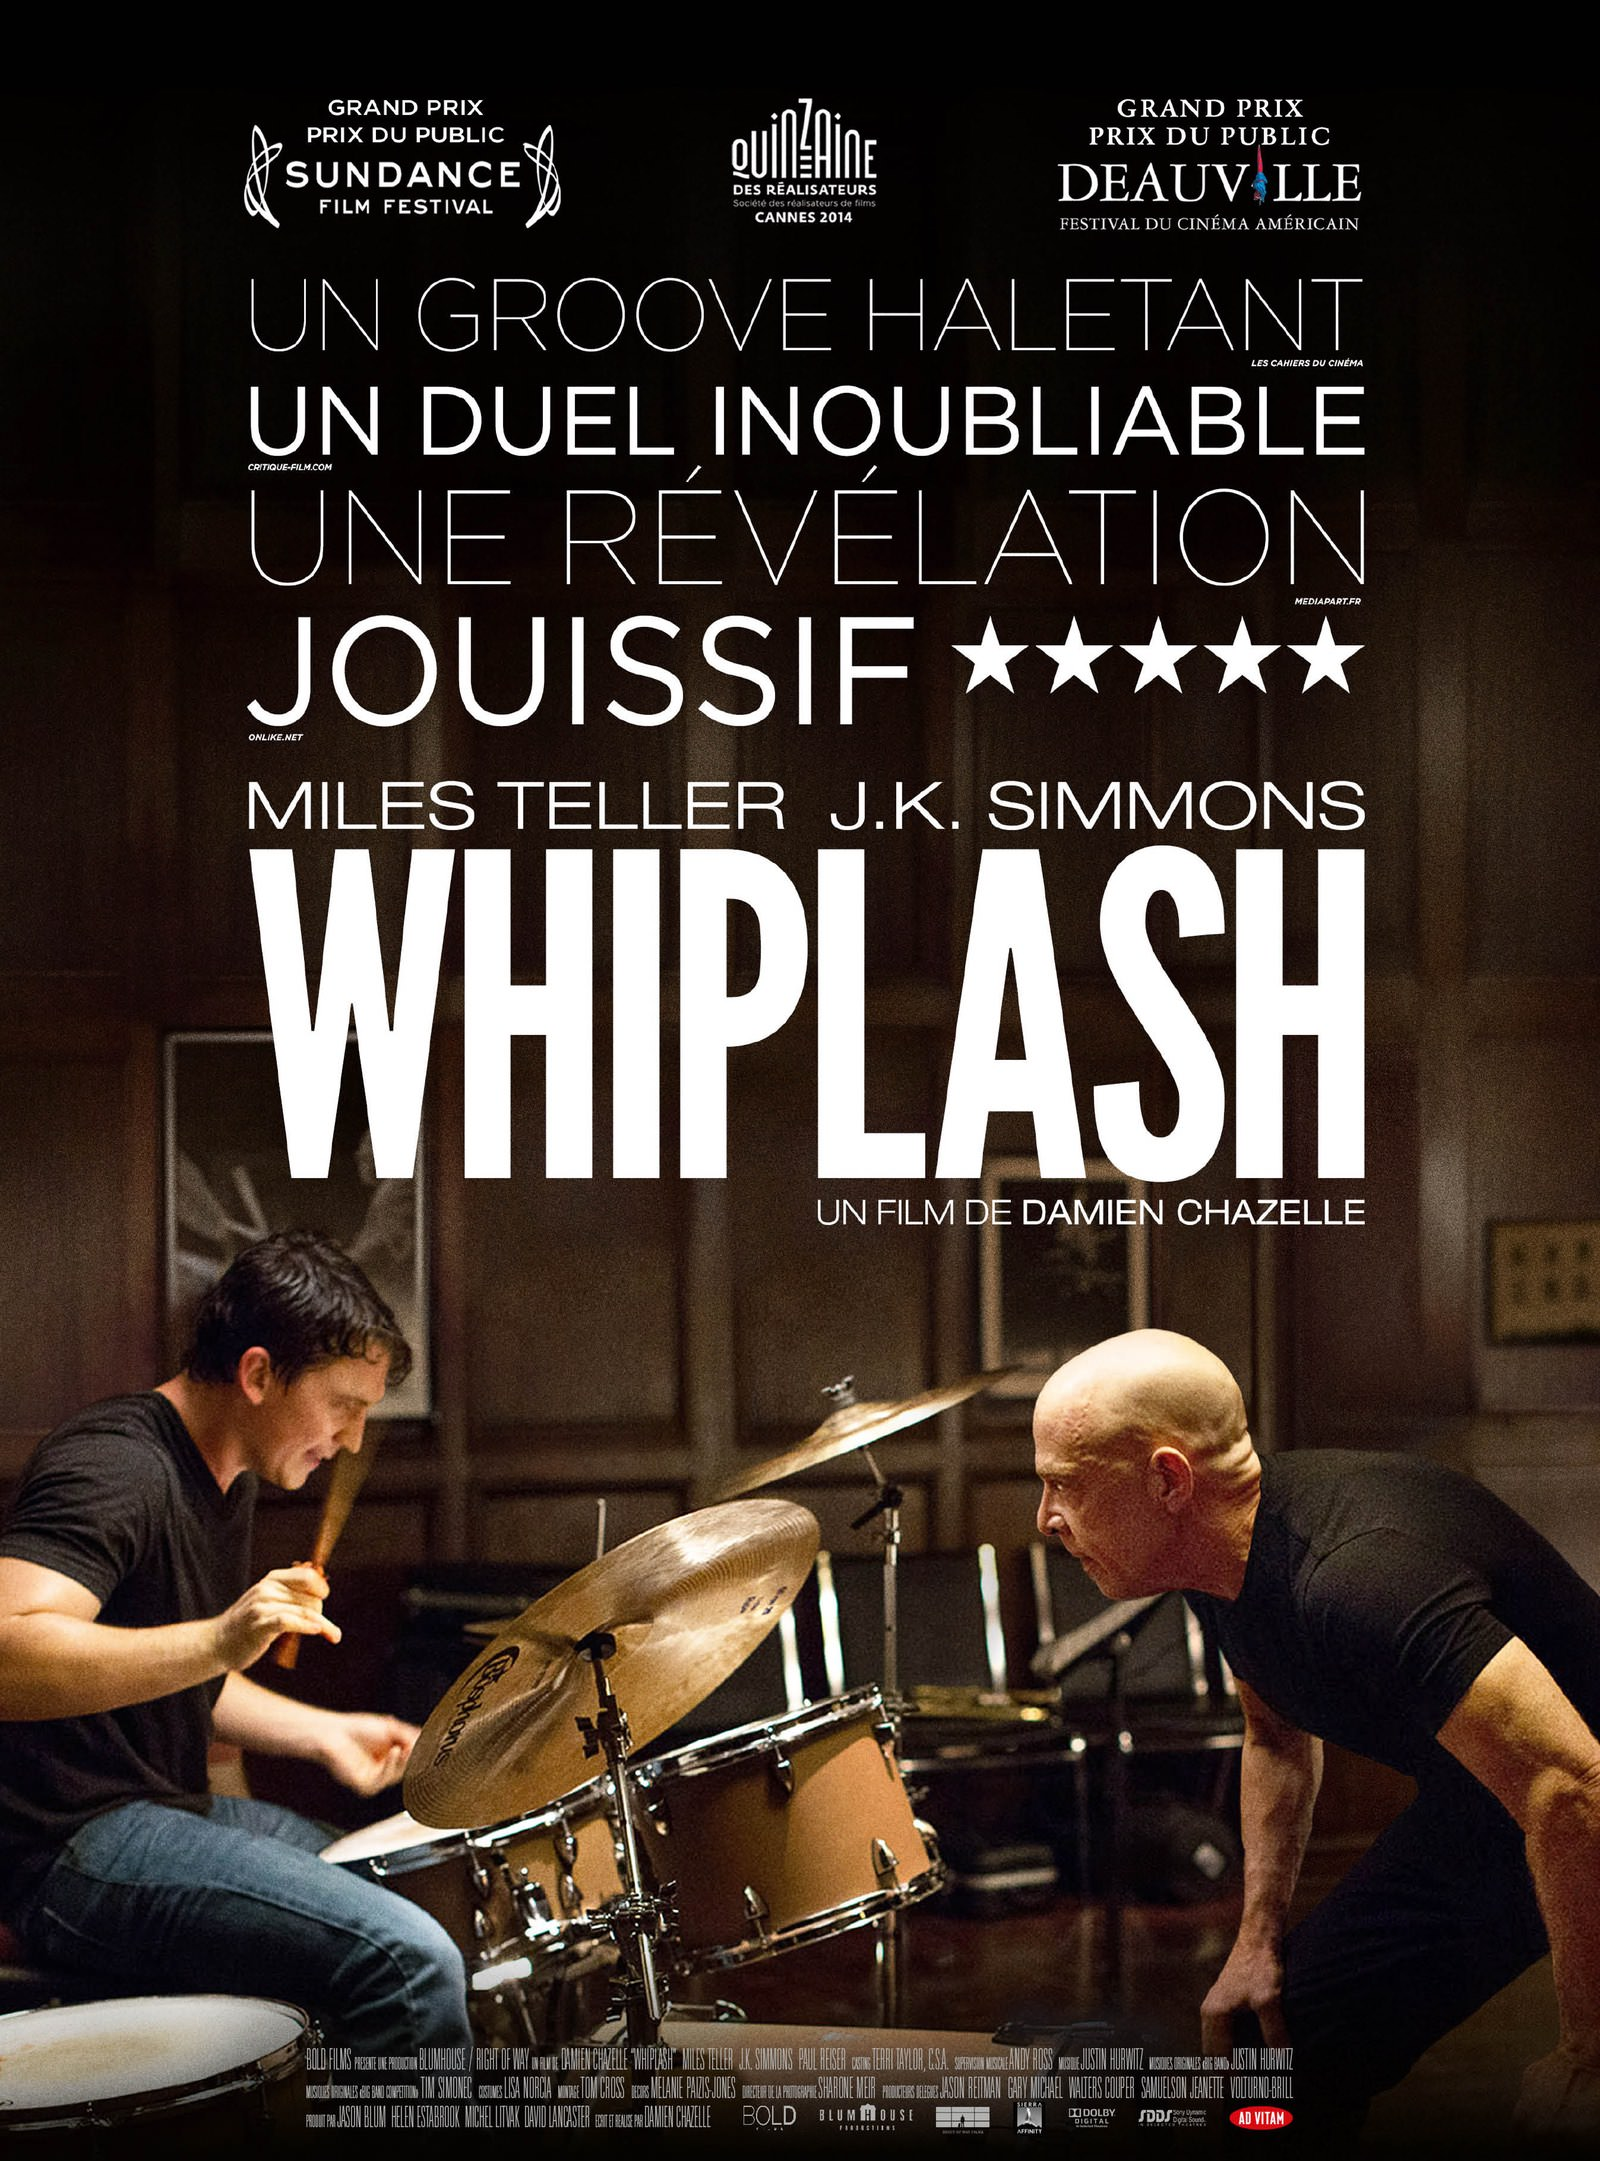 Whiplash chazelle